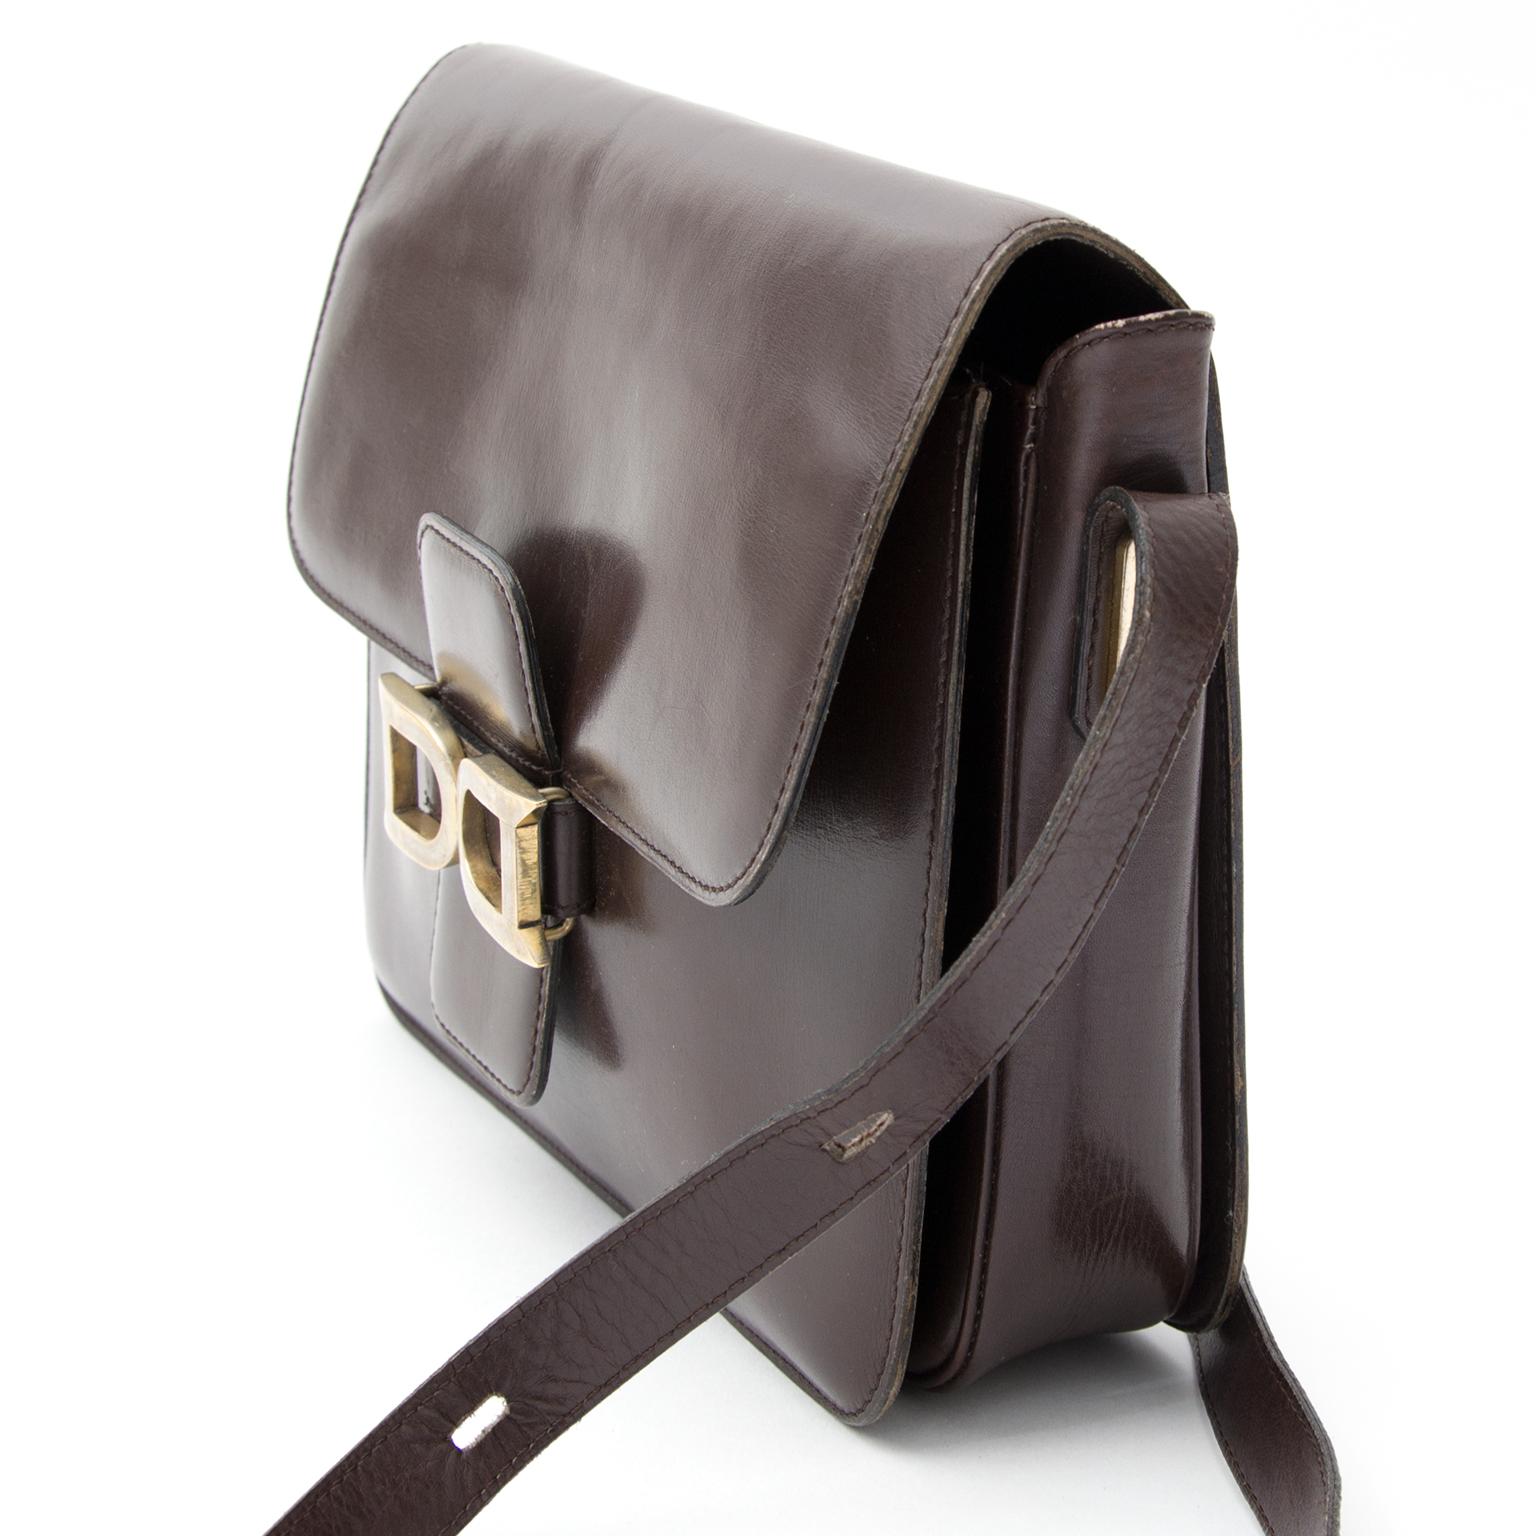 c4c3e6be1e0e Buy authentic secondhand Delvaux bags at the shop safe online secondhand  designer vintage Delvaux Dark Brown Bourgogne Shoulder Bag